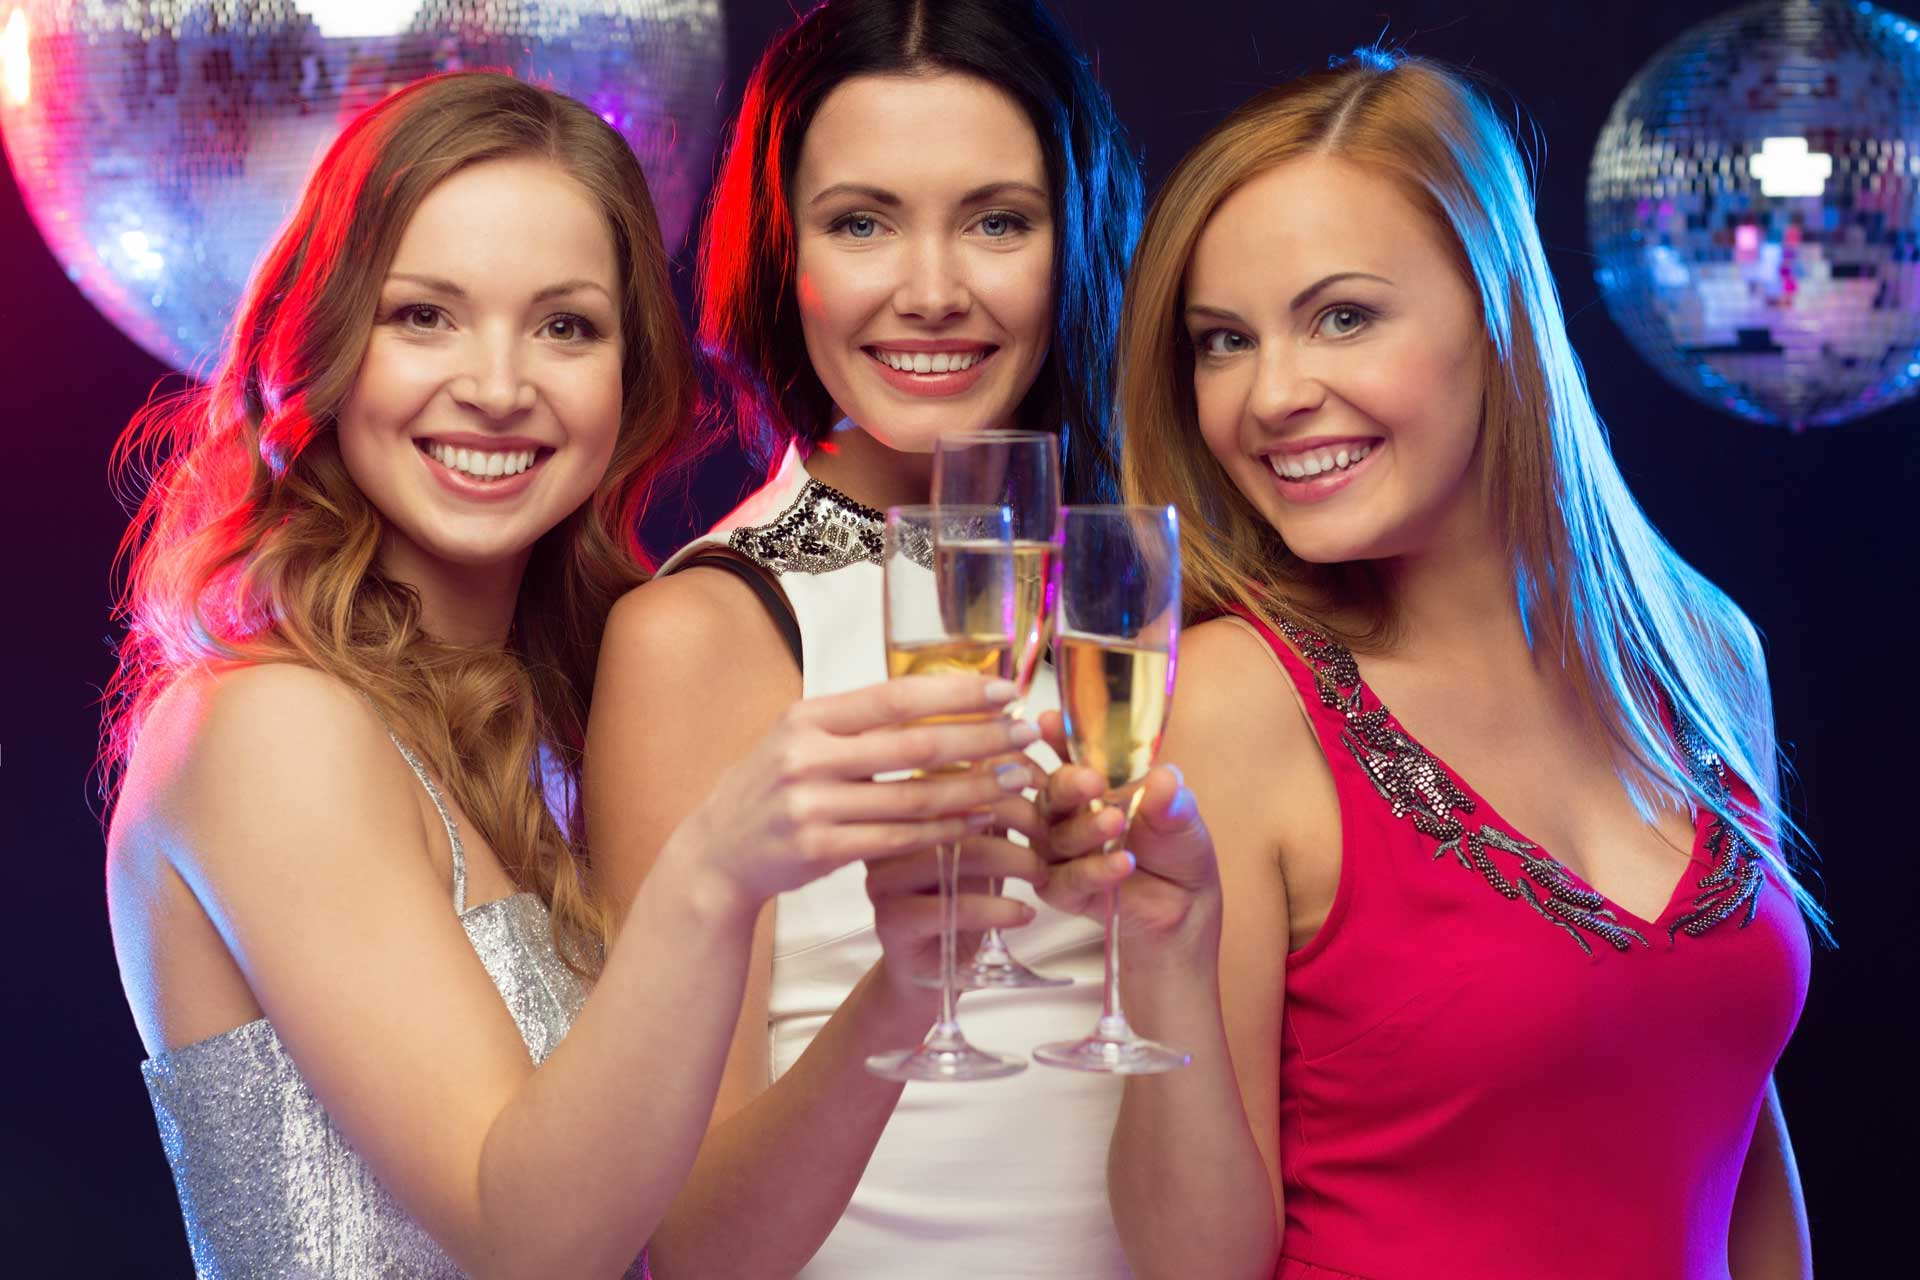 Bachelorette Party Ideas for a wild bachelorette party